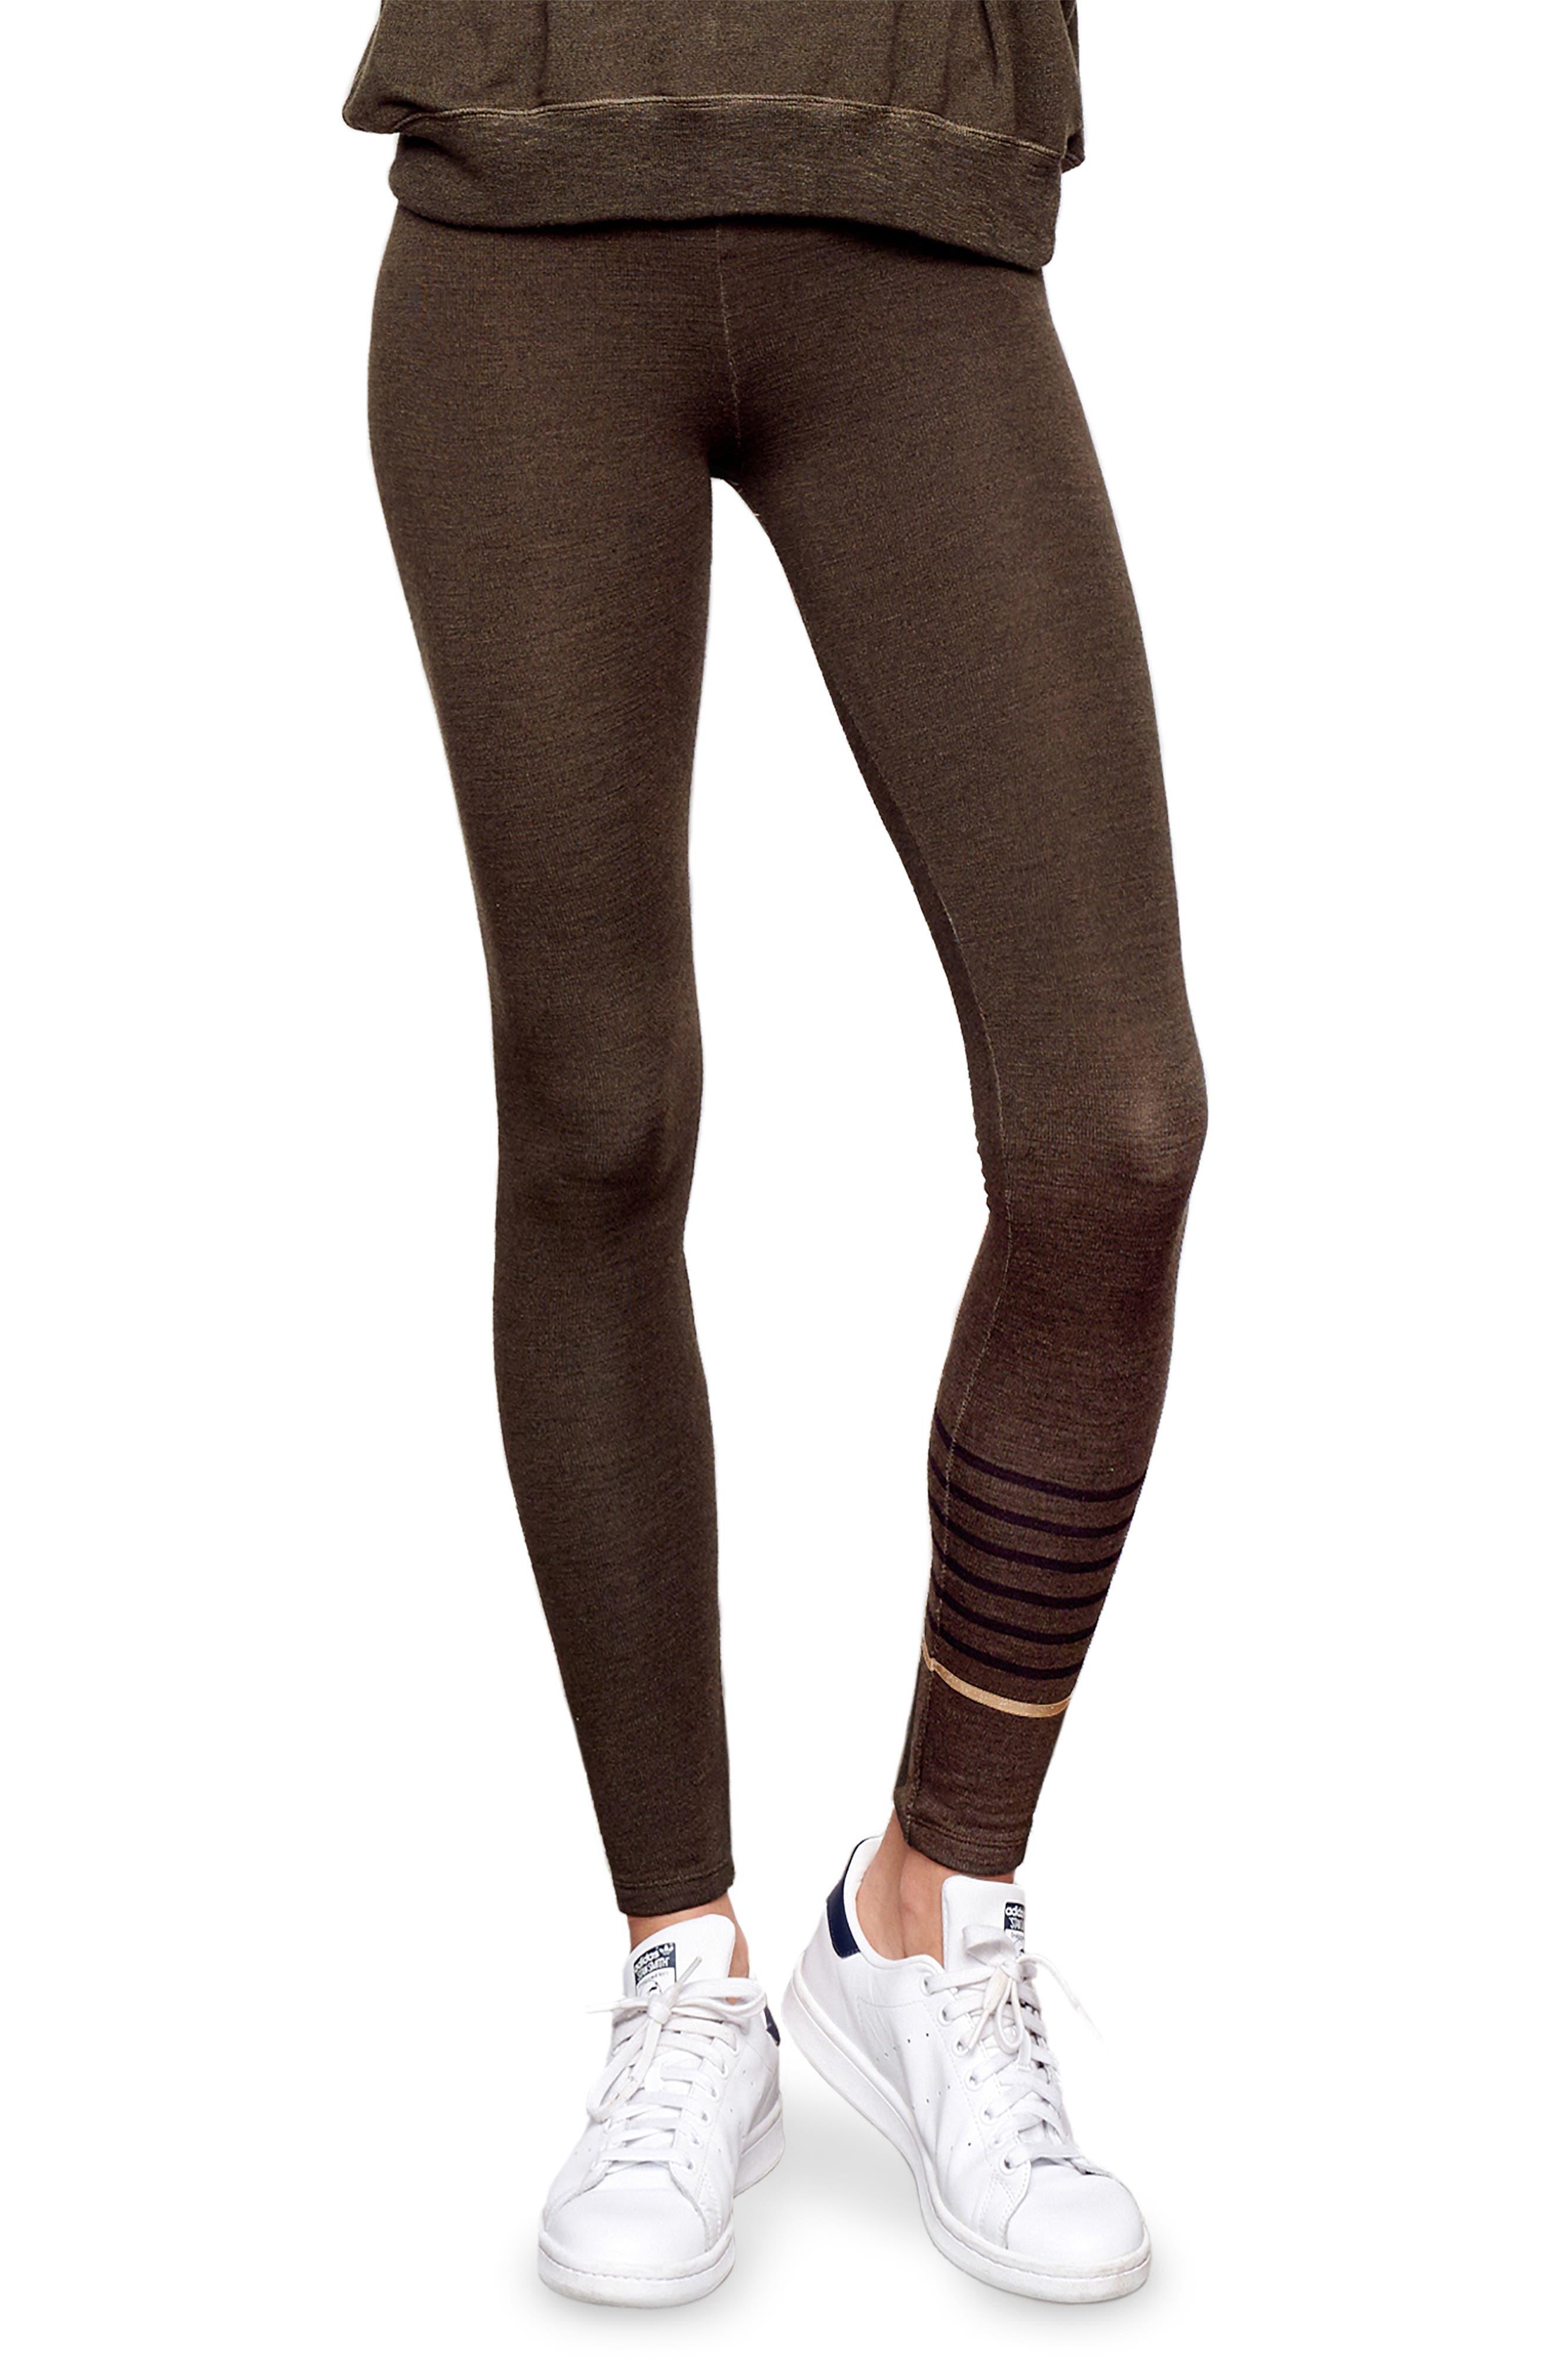 Stripe Yoga Pants,                         Main,                         color, 301